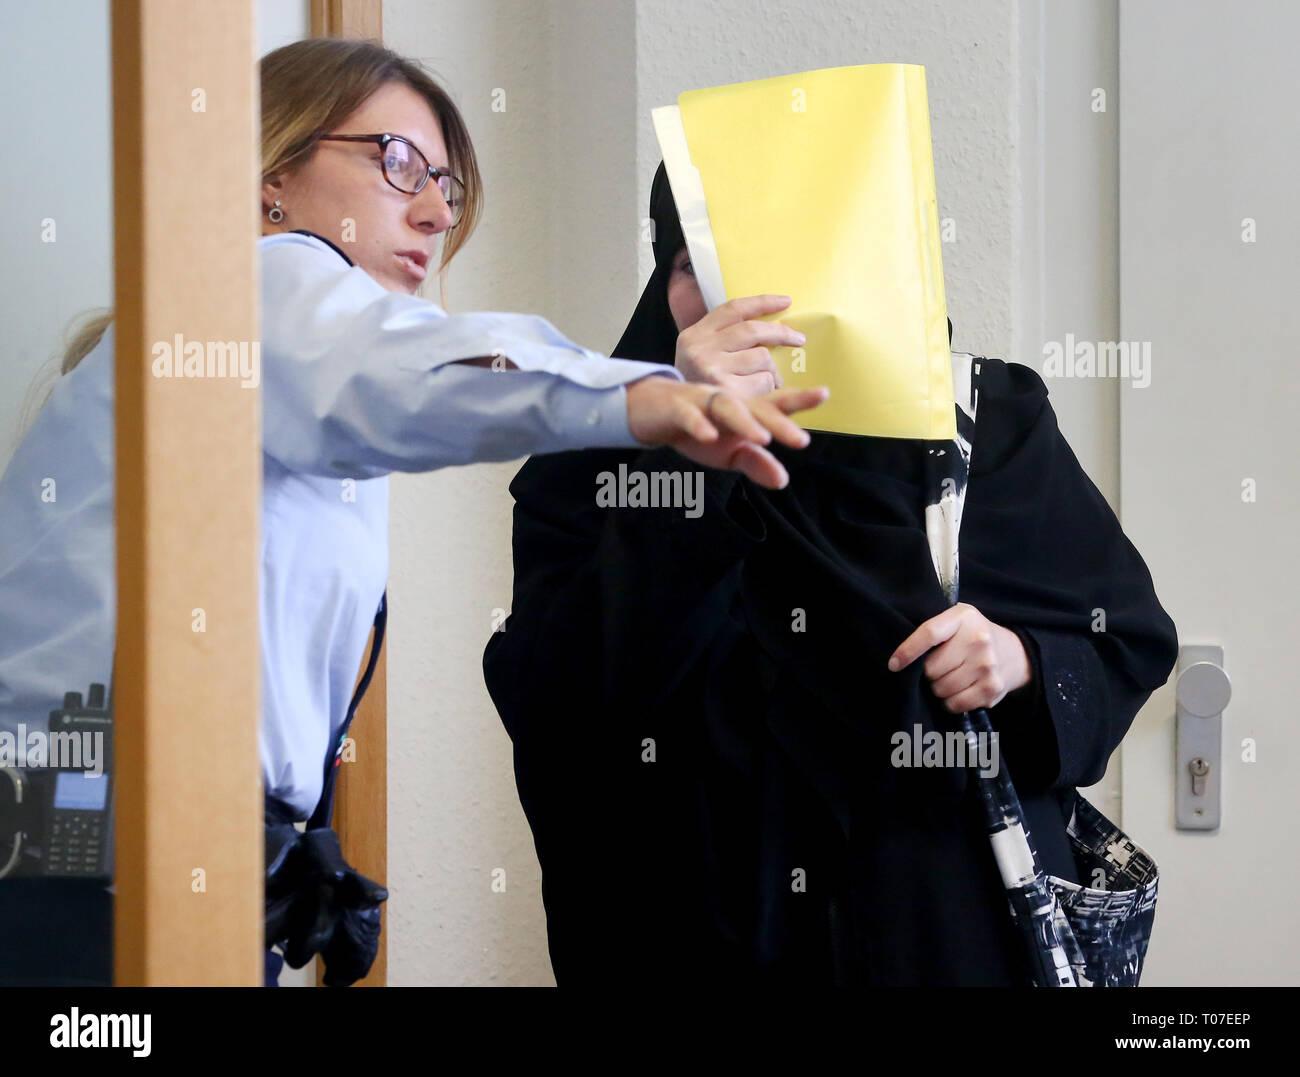 Court Clerk Stock Photos & Court Clerk Stock Images - Alamy